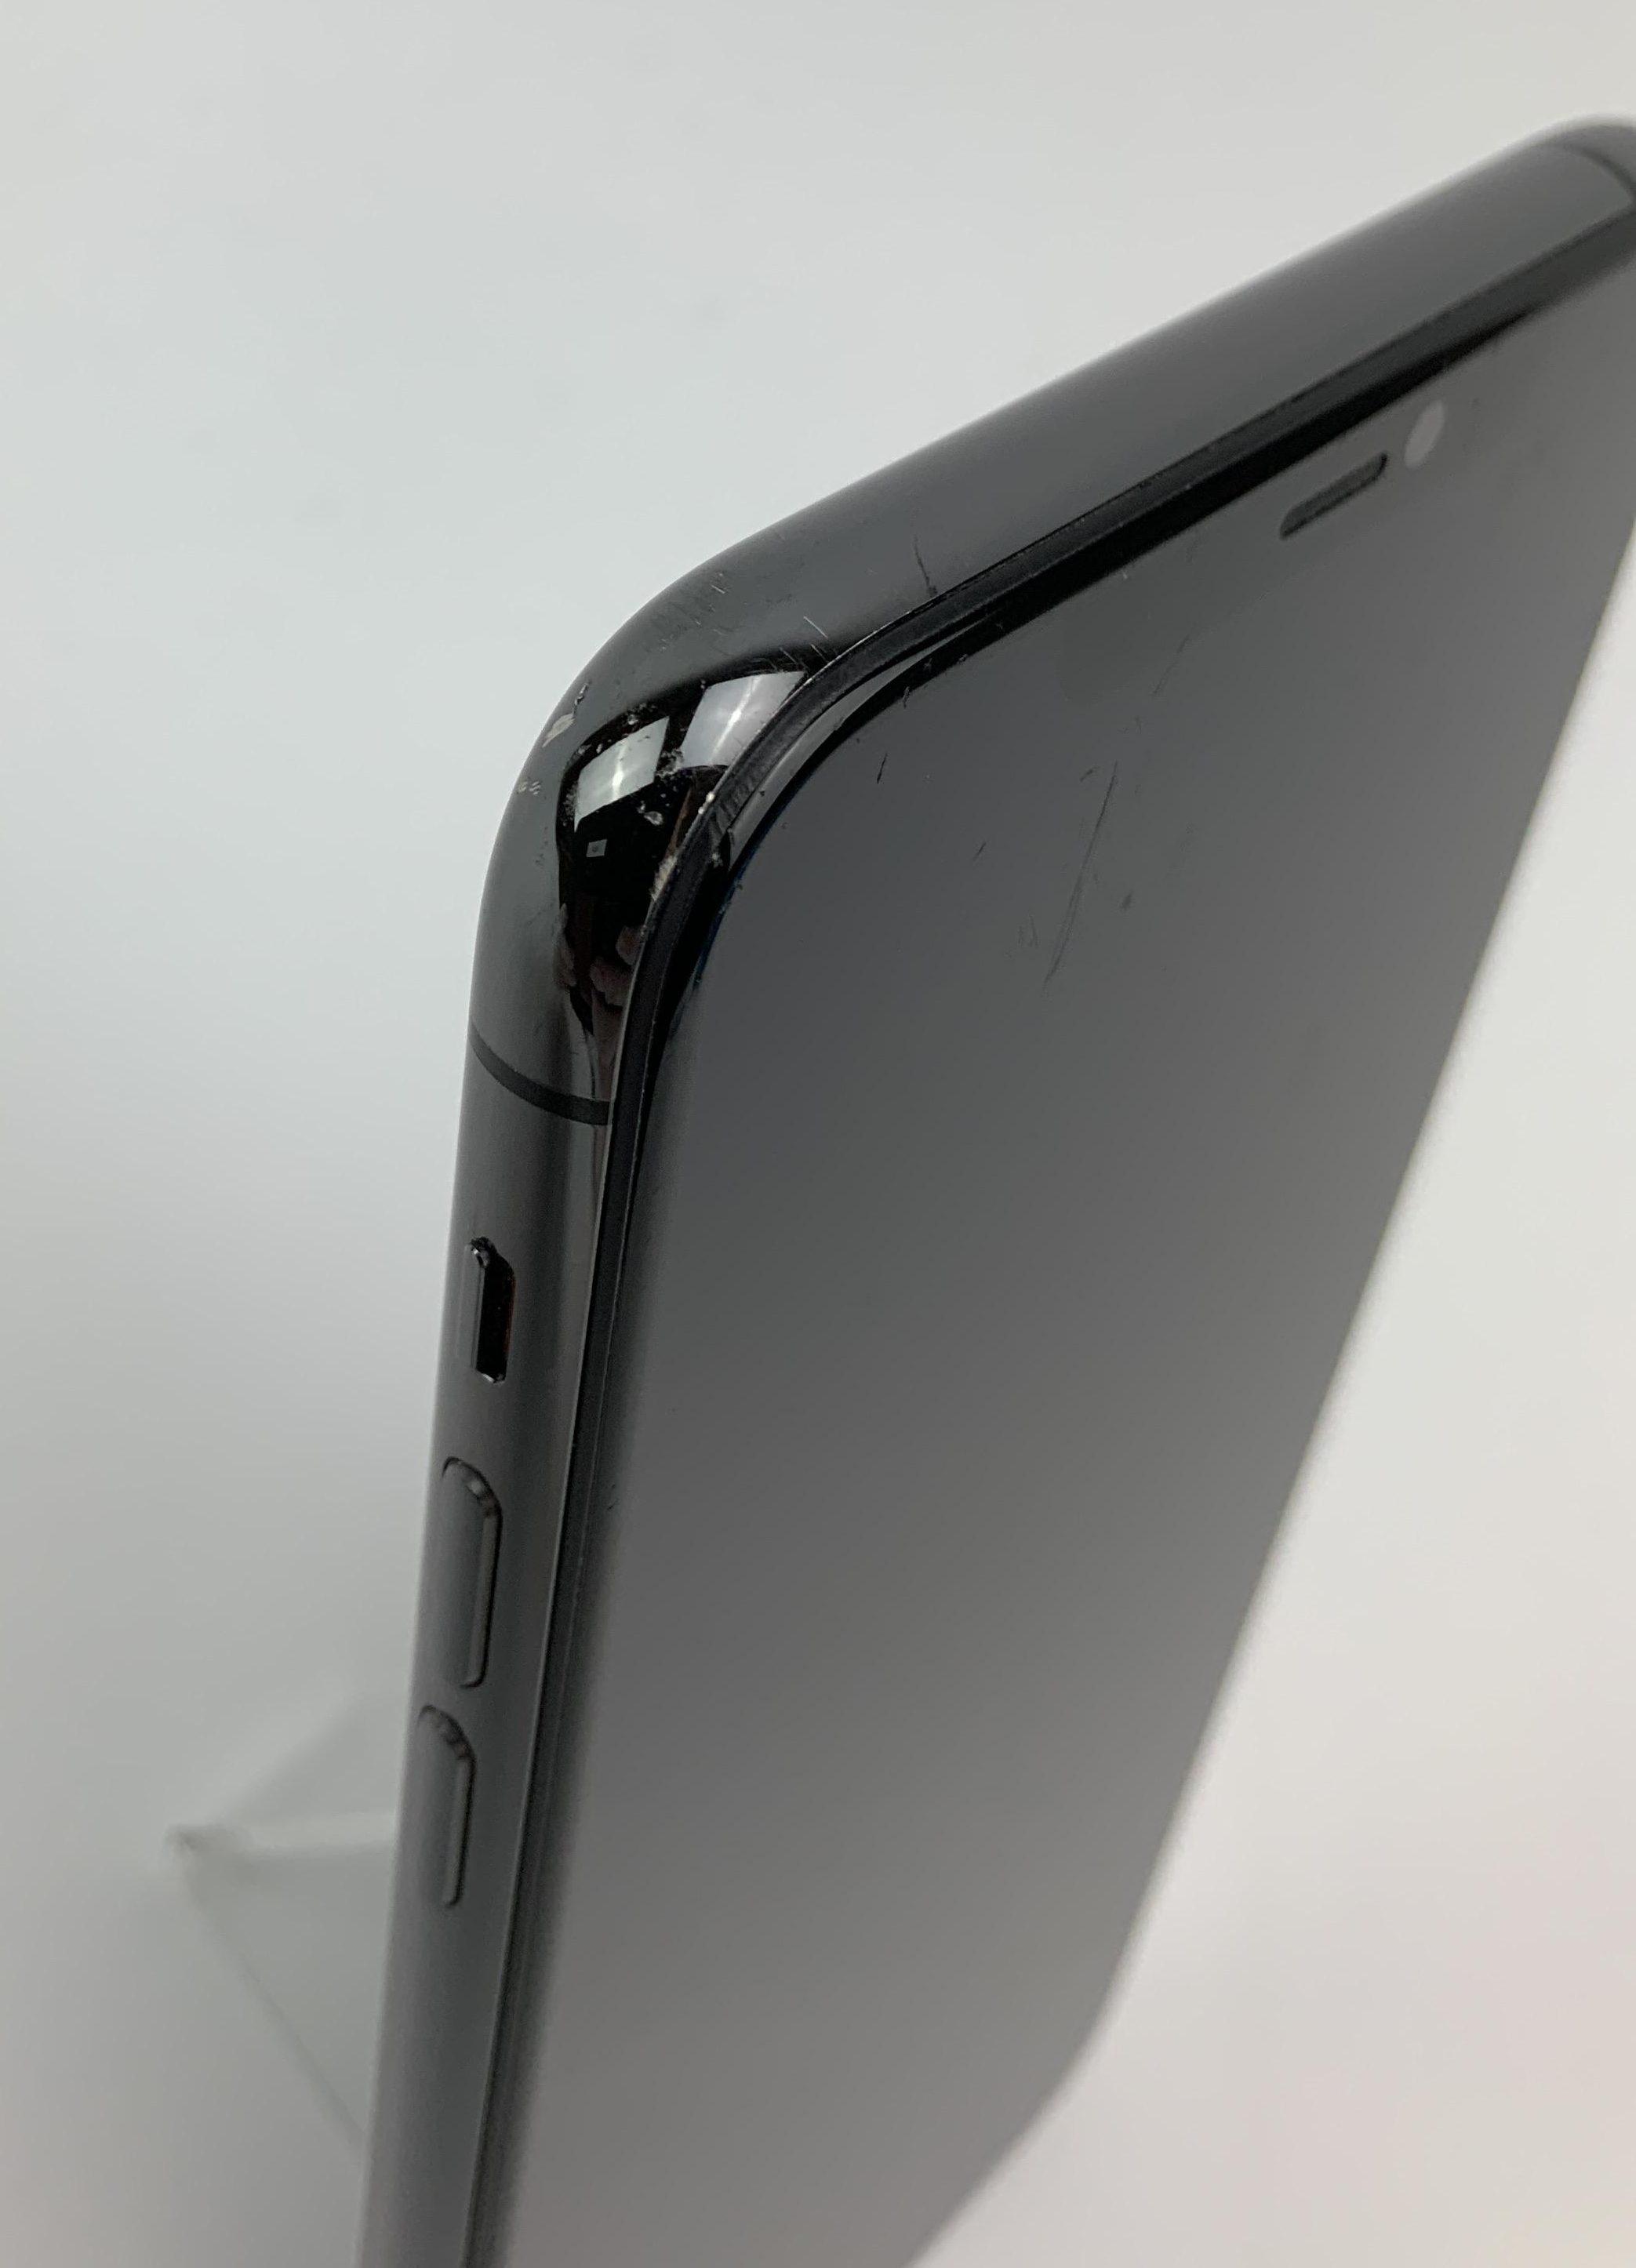 iPhone 11 Pro Max 64GB, 64GB, Space Gray, imagen 3